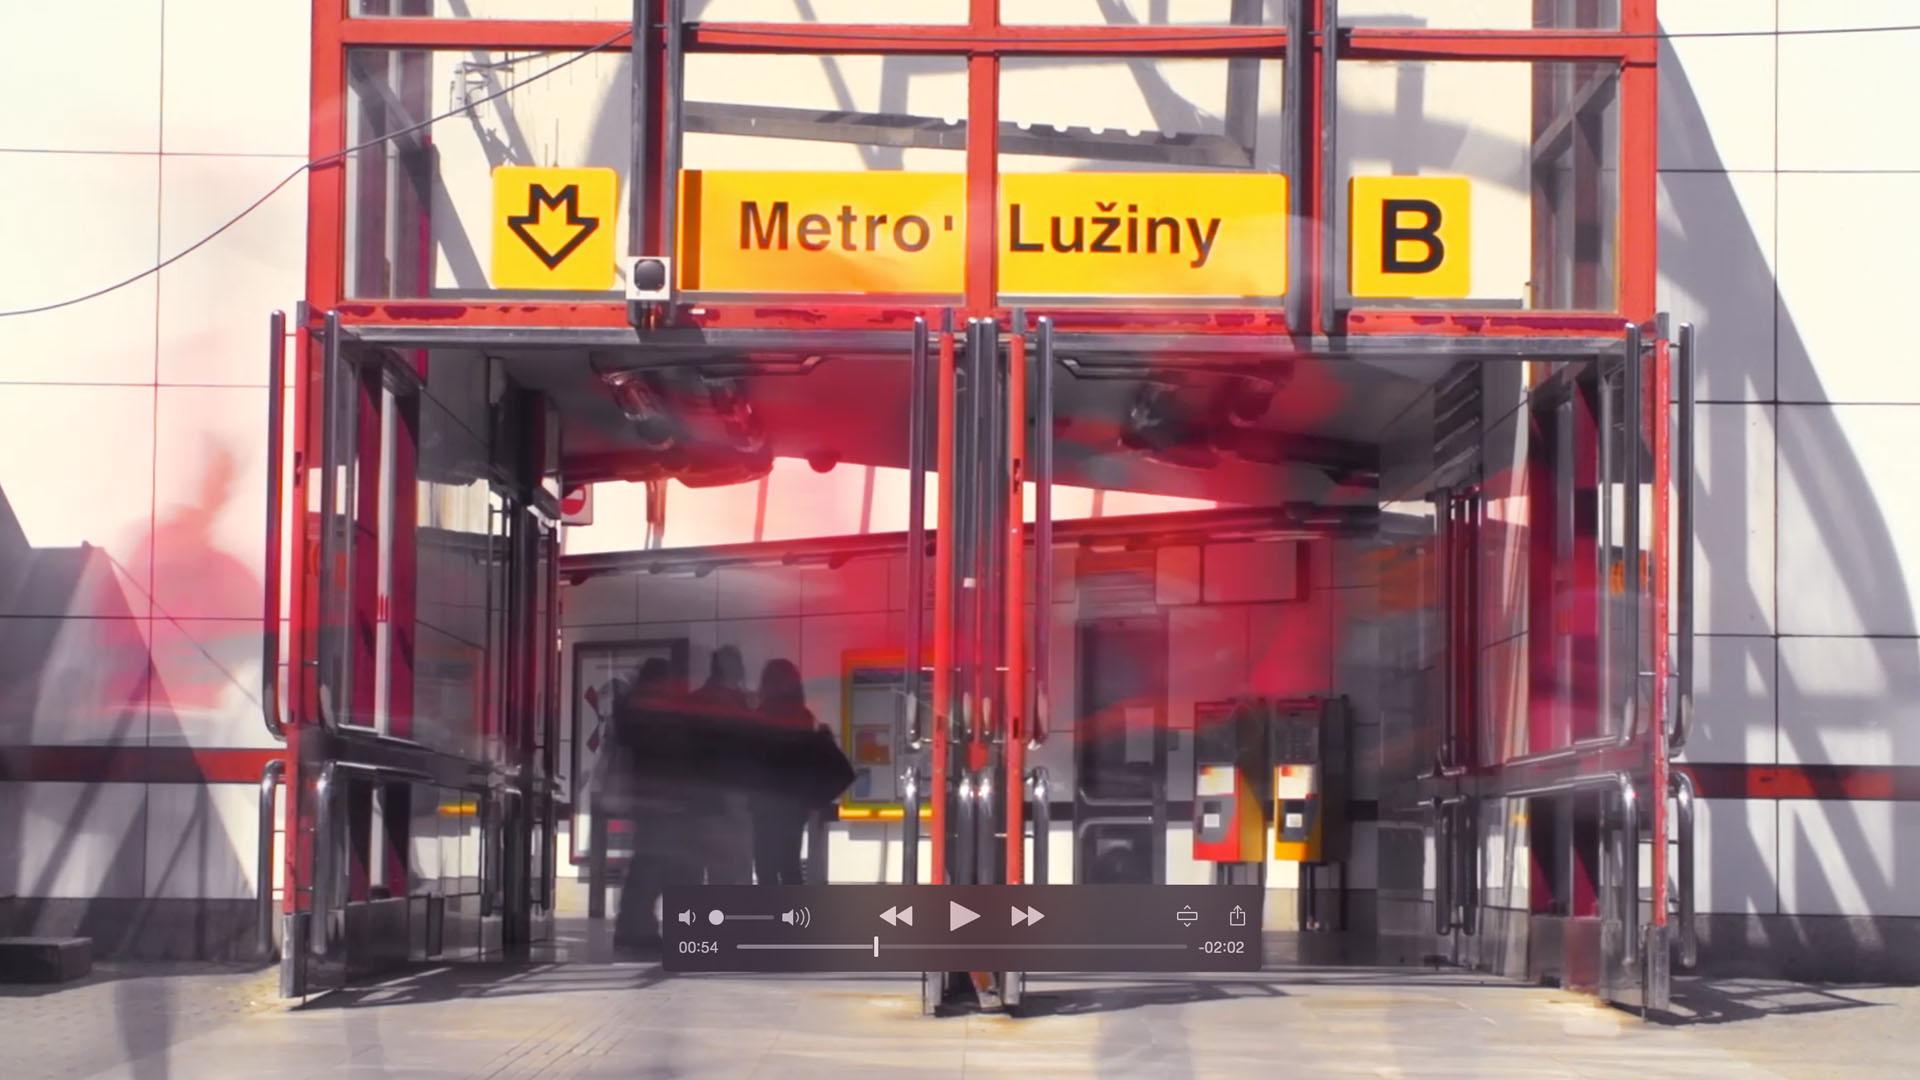 [lokalita/jrm_lokalita_metro_luziny.jpg]